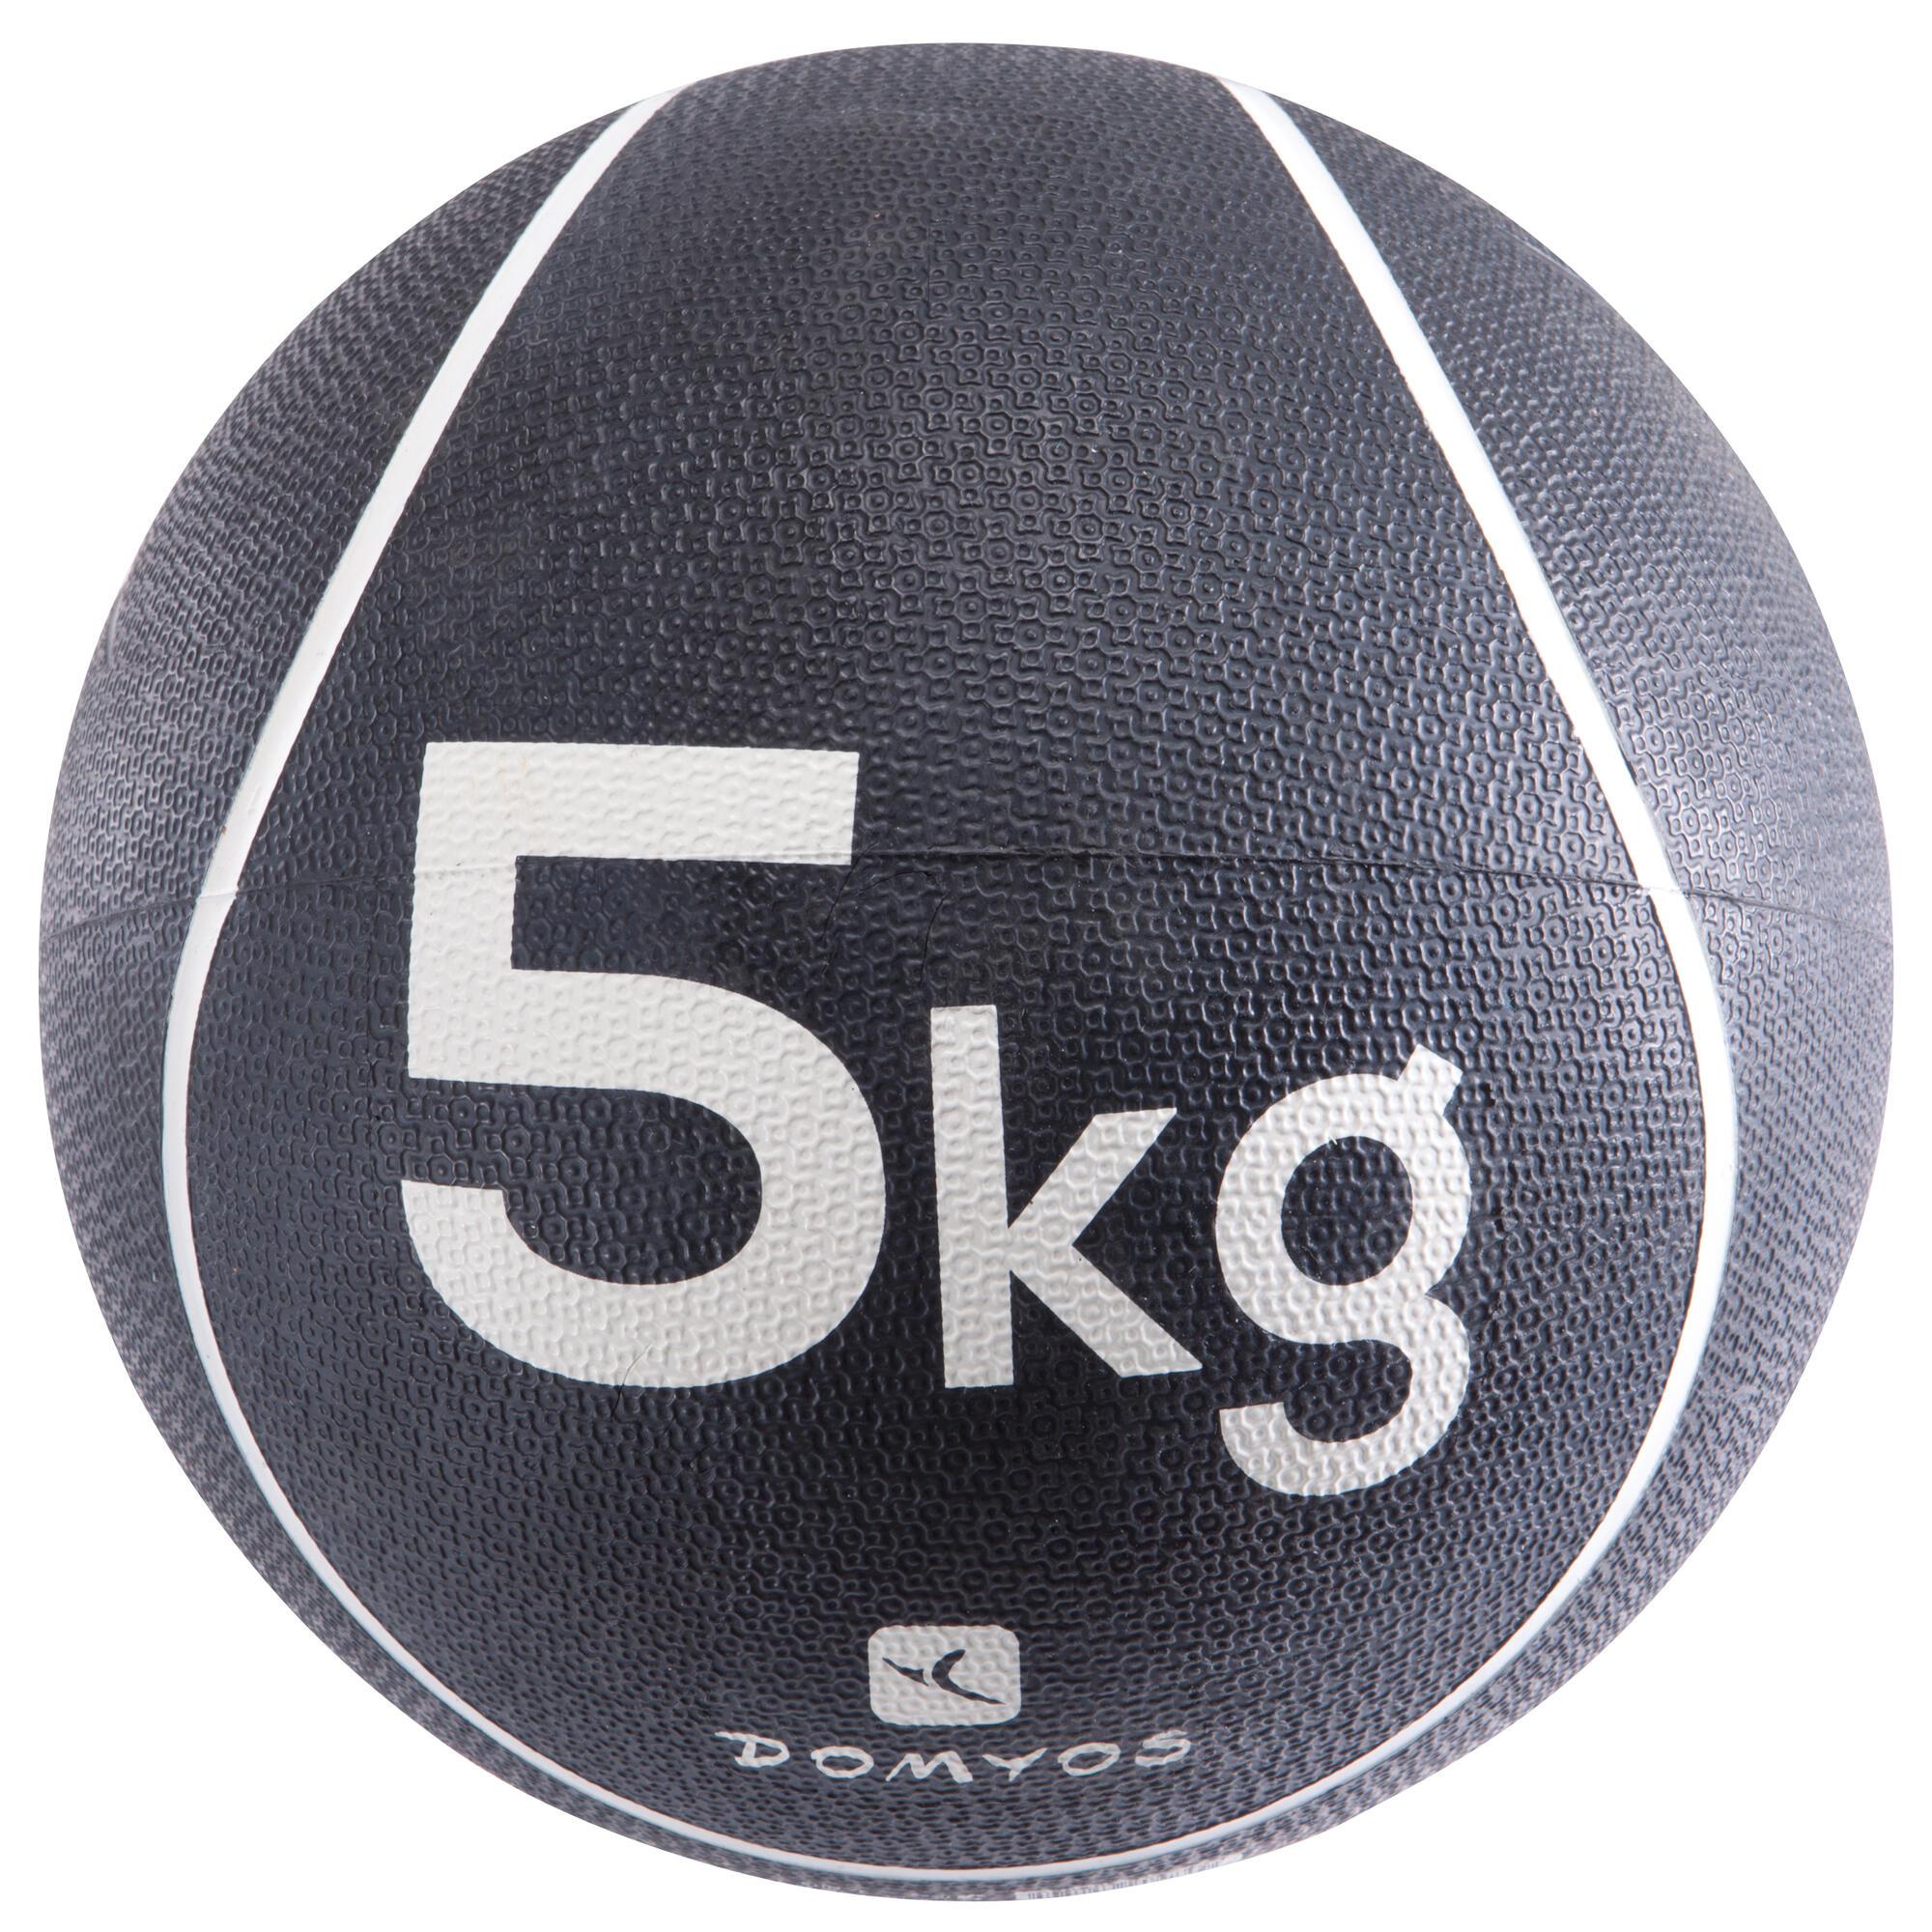 ballon lest 5 kg domyos by decathlon. Black Bedroom Furniture Sets. Home Design Ideas